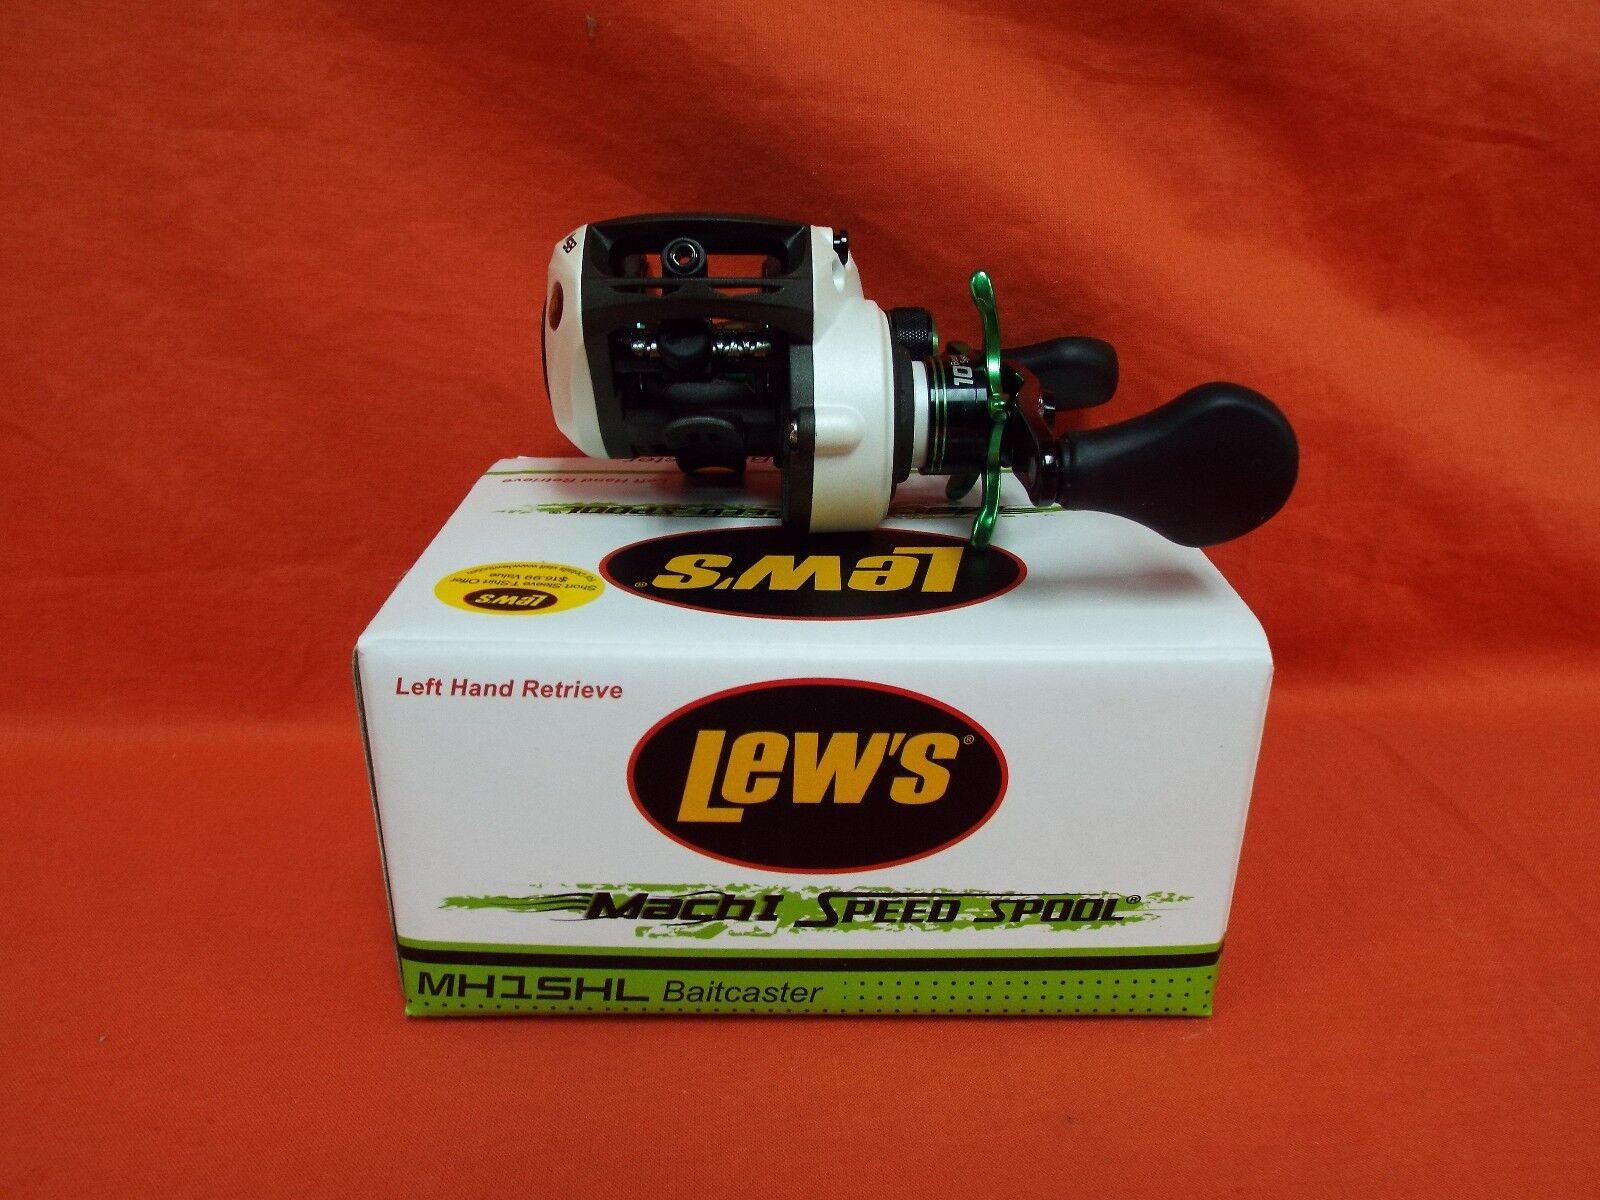 LEW'S Mach I Speed Spool Baitcast Reel Gear Ratio 7.1 1 MH1SHL (LH)